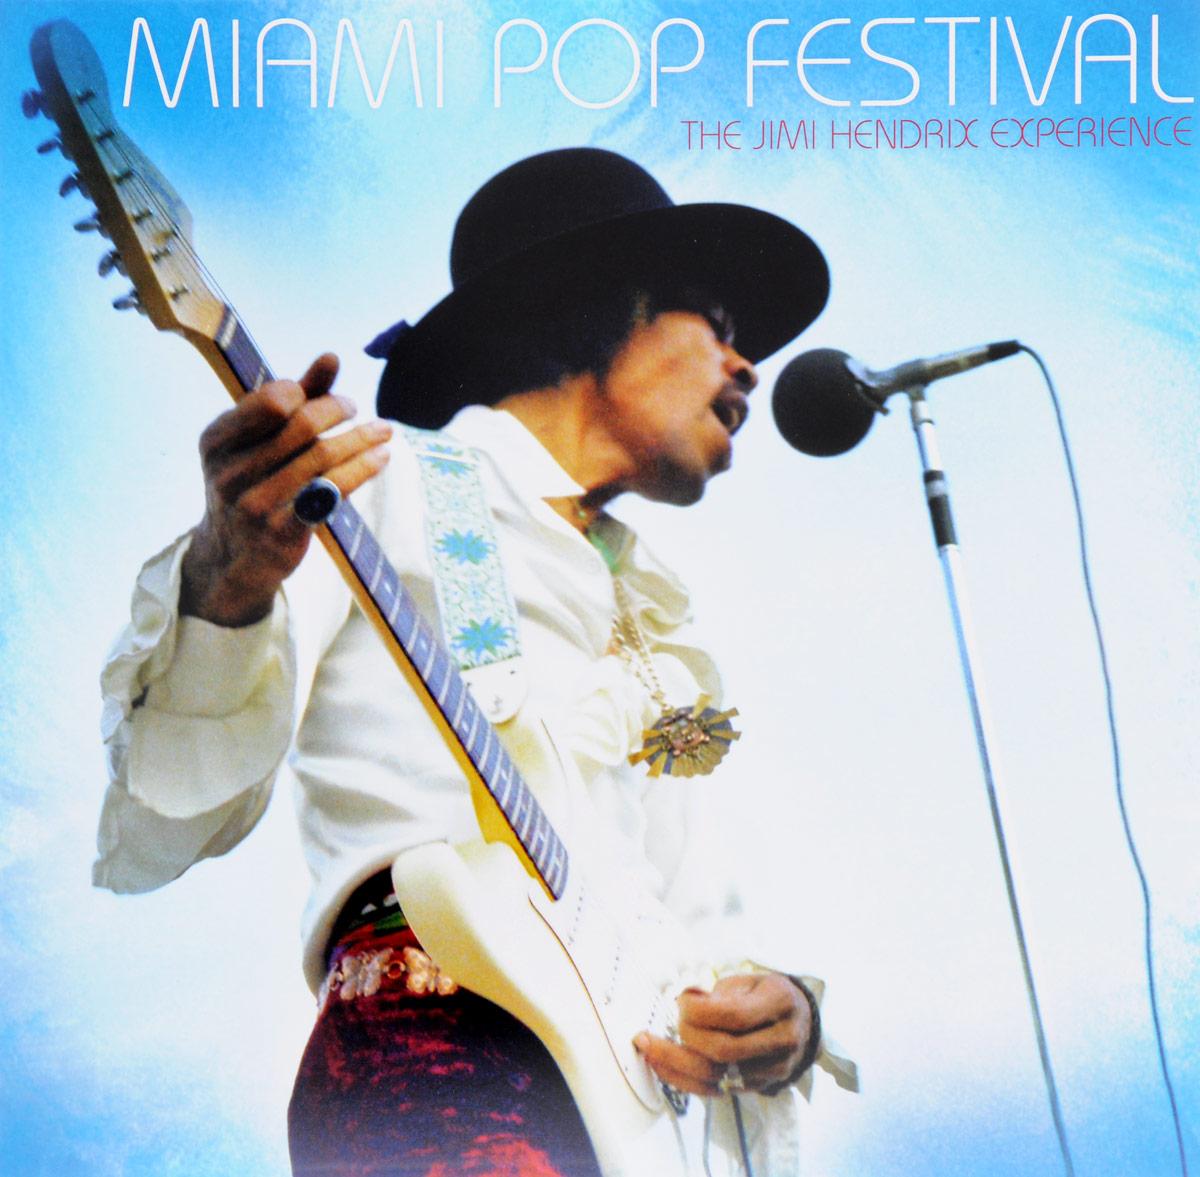 джими хендрикс jimi hendrix experience hendrix the best of jimi hendrix 2 lp Джими Хендрикс Jimi Hendrix. Miami Pop Festival (Experience) (2 LP)